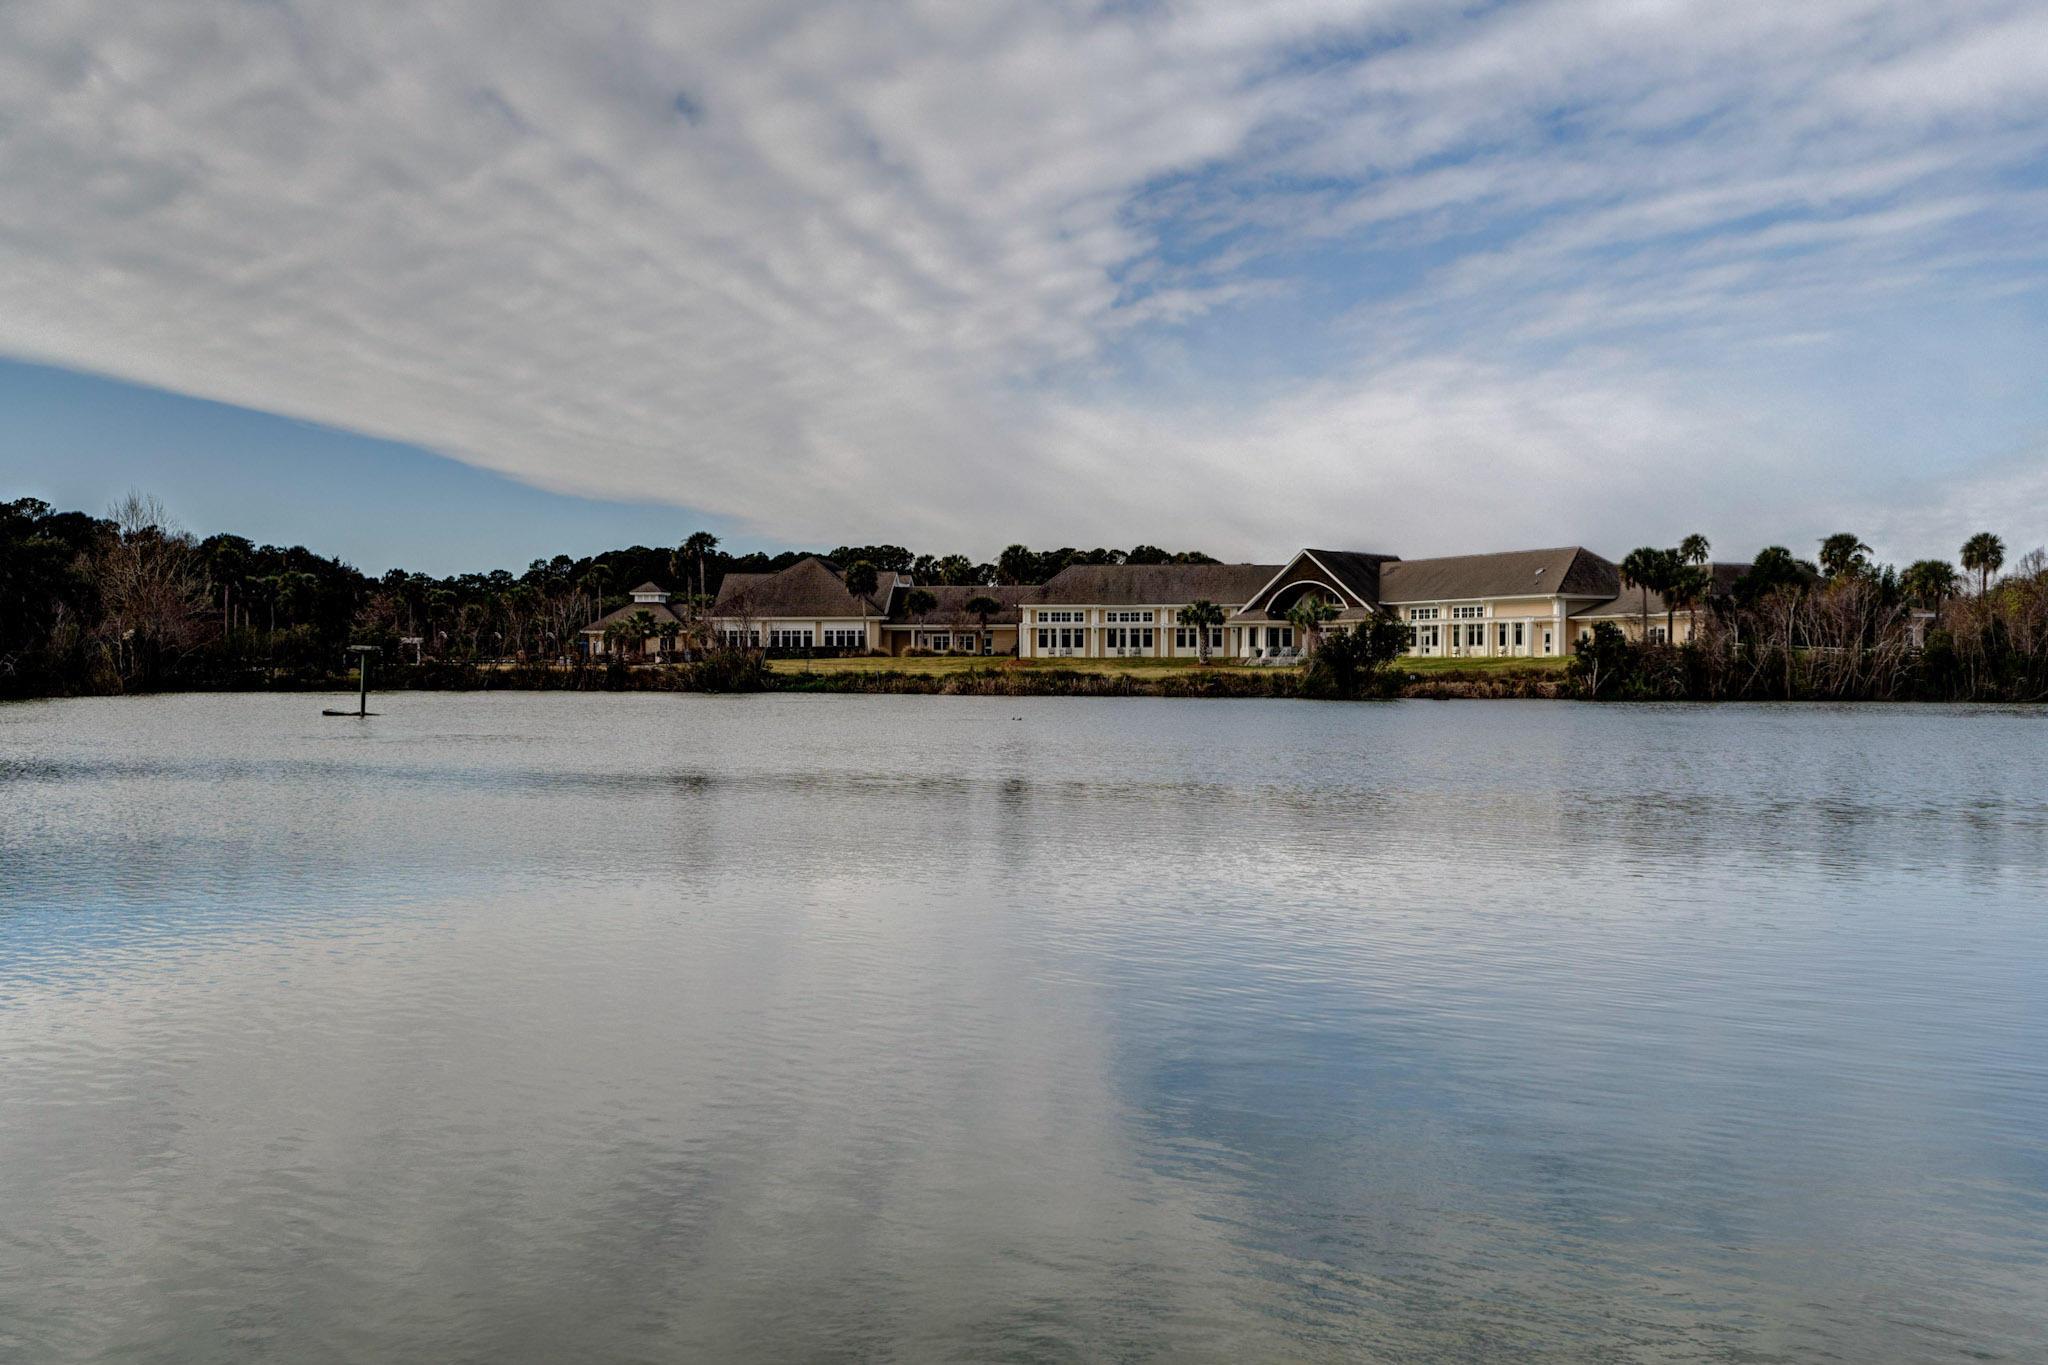 Creek Watch Villas Homes For Sale - 1244 Creek Watch, Johns Island, SC - 24